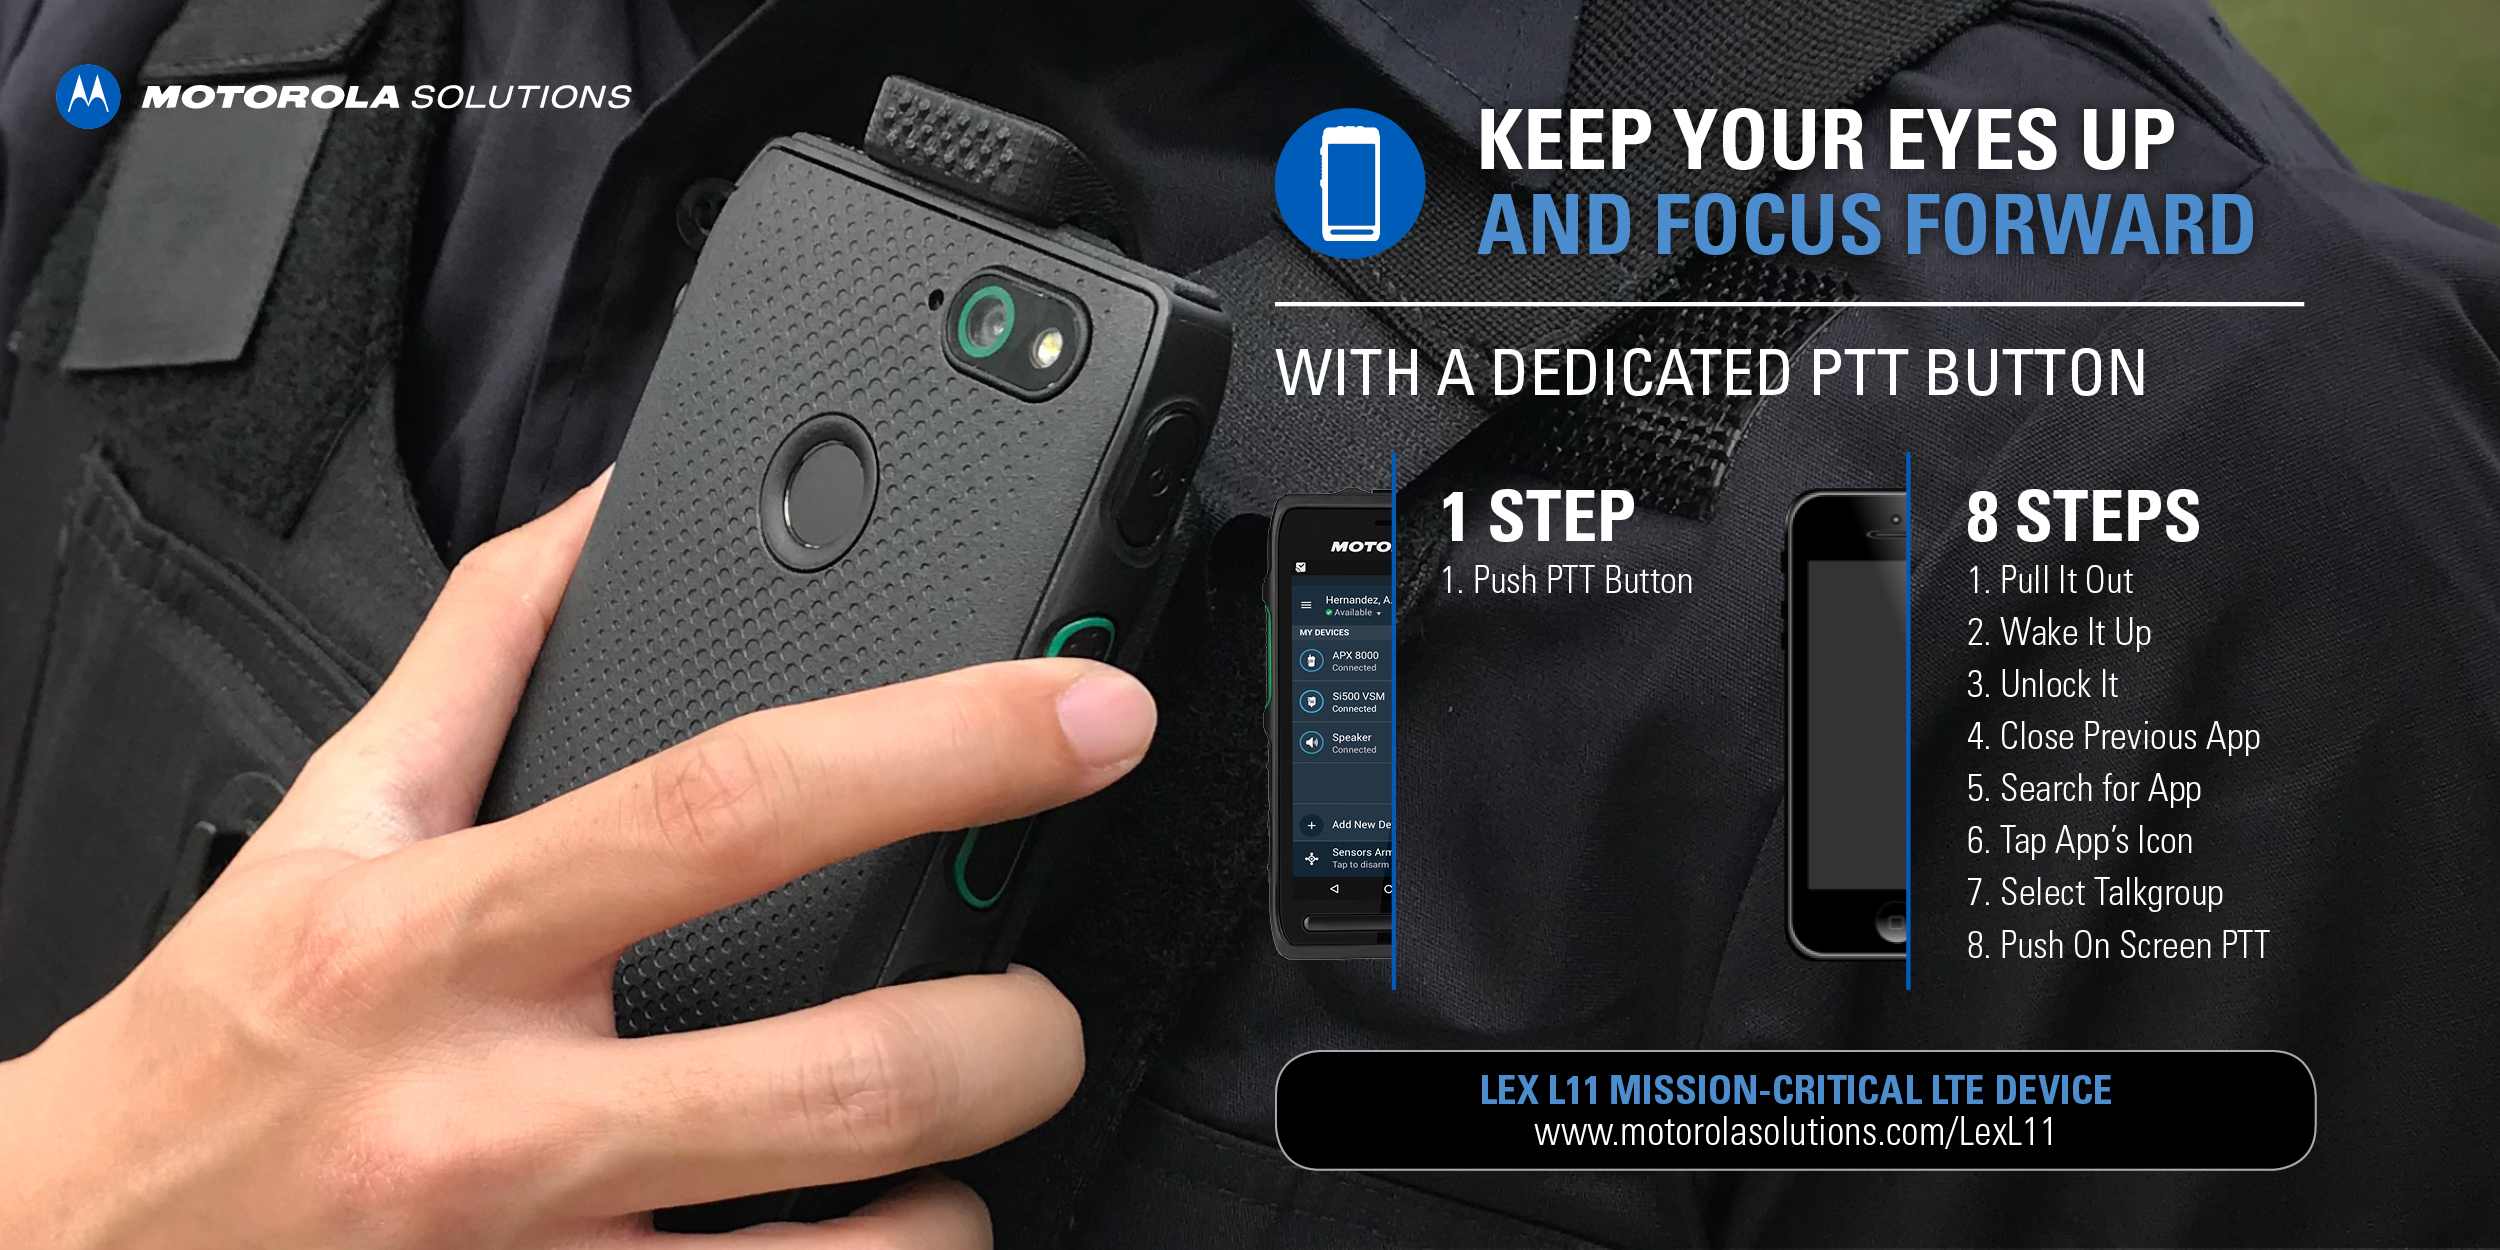 LEX L11 Mission Critical Handheld LTE Device - Motorola Solutions